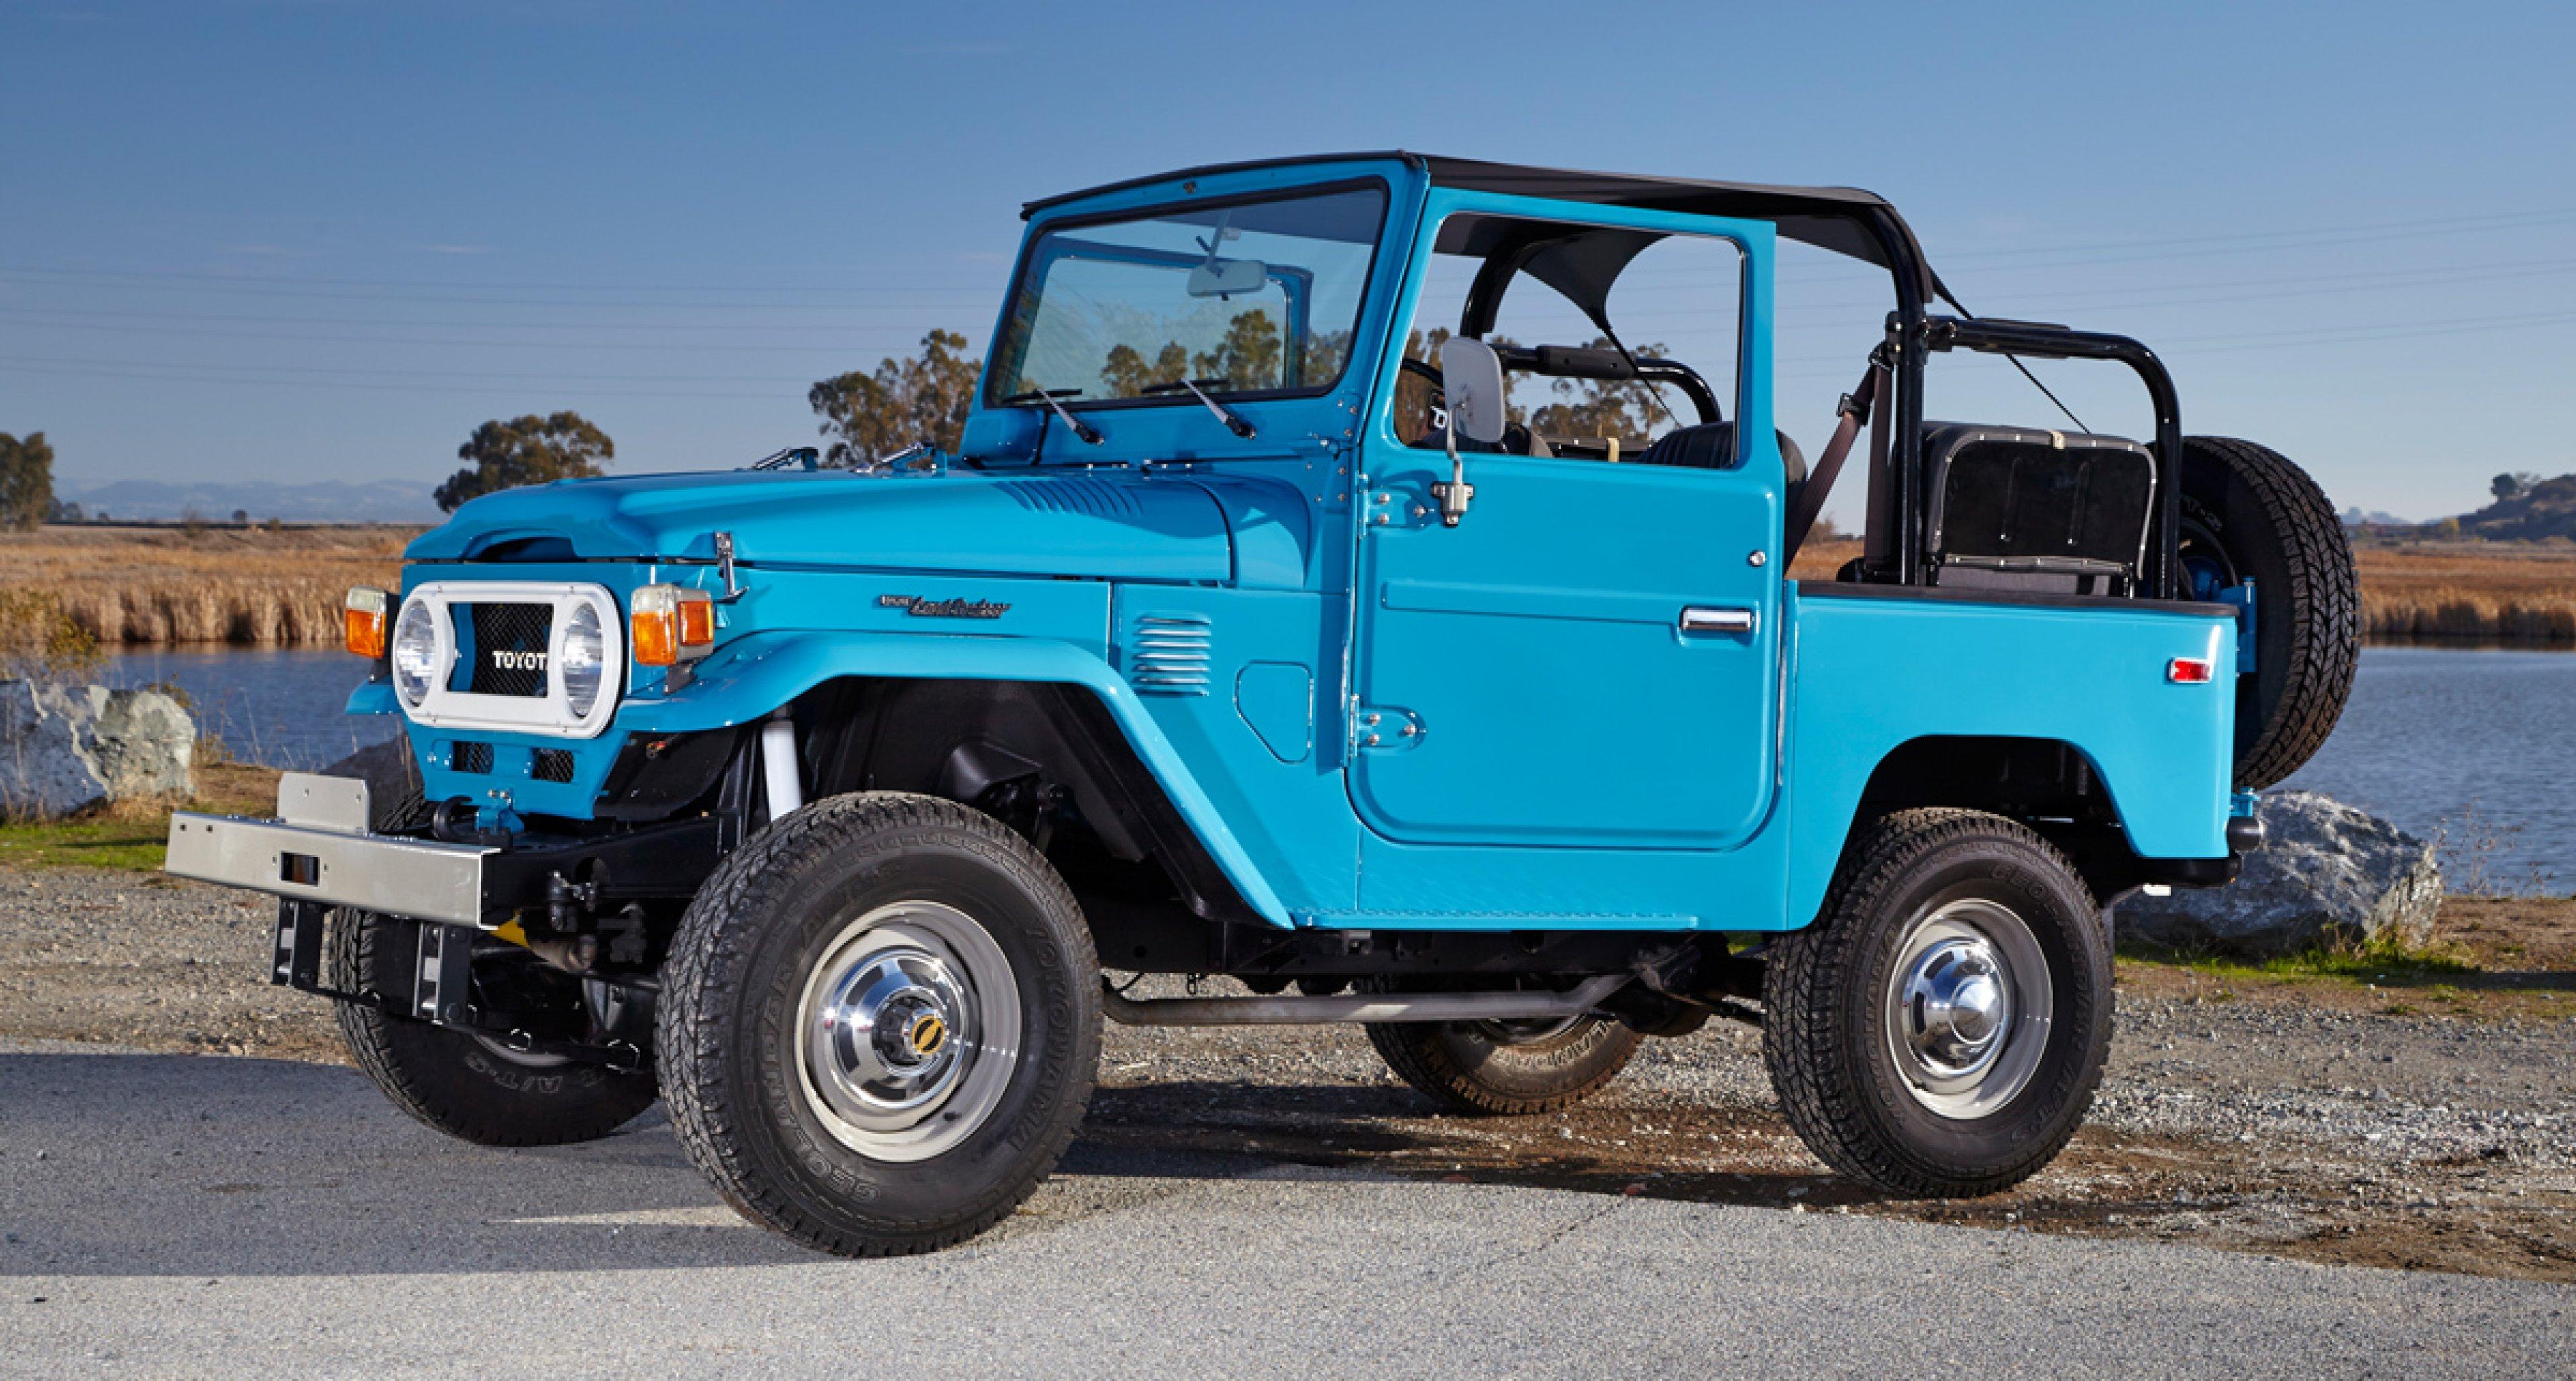 Bonhams: 1978 Toyota Land Cruiser FJ40 (USD 35.000 - 45.000)